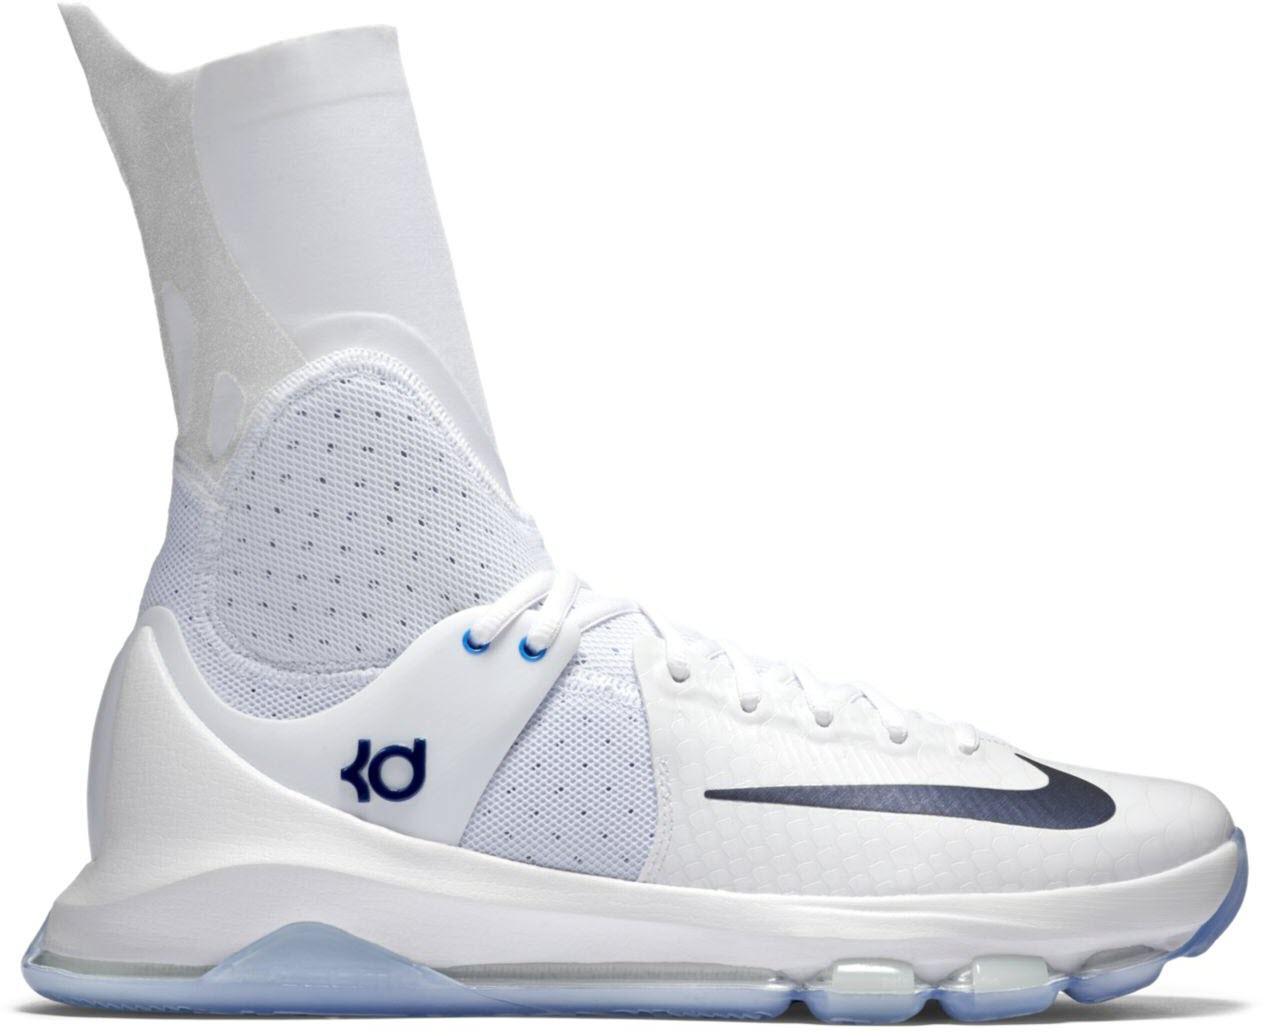 kd 8 elite Kevin Durant shoes on sale